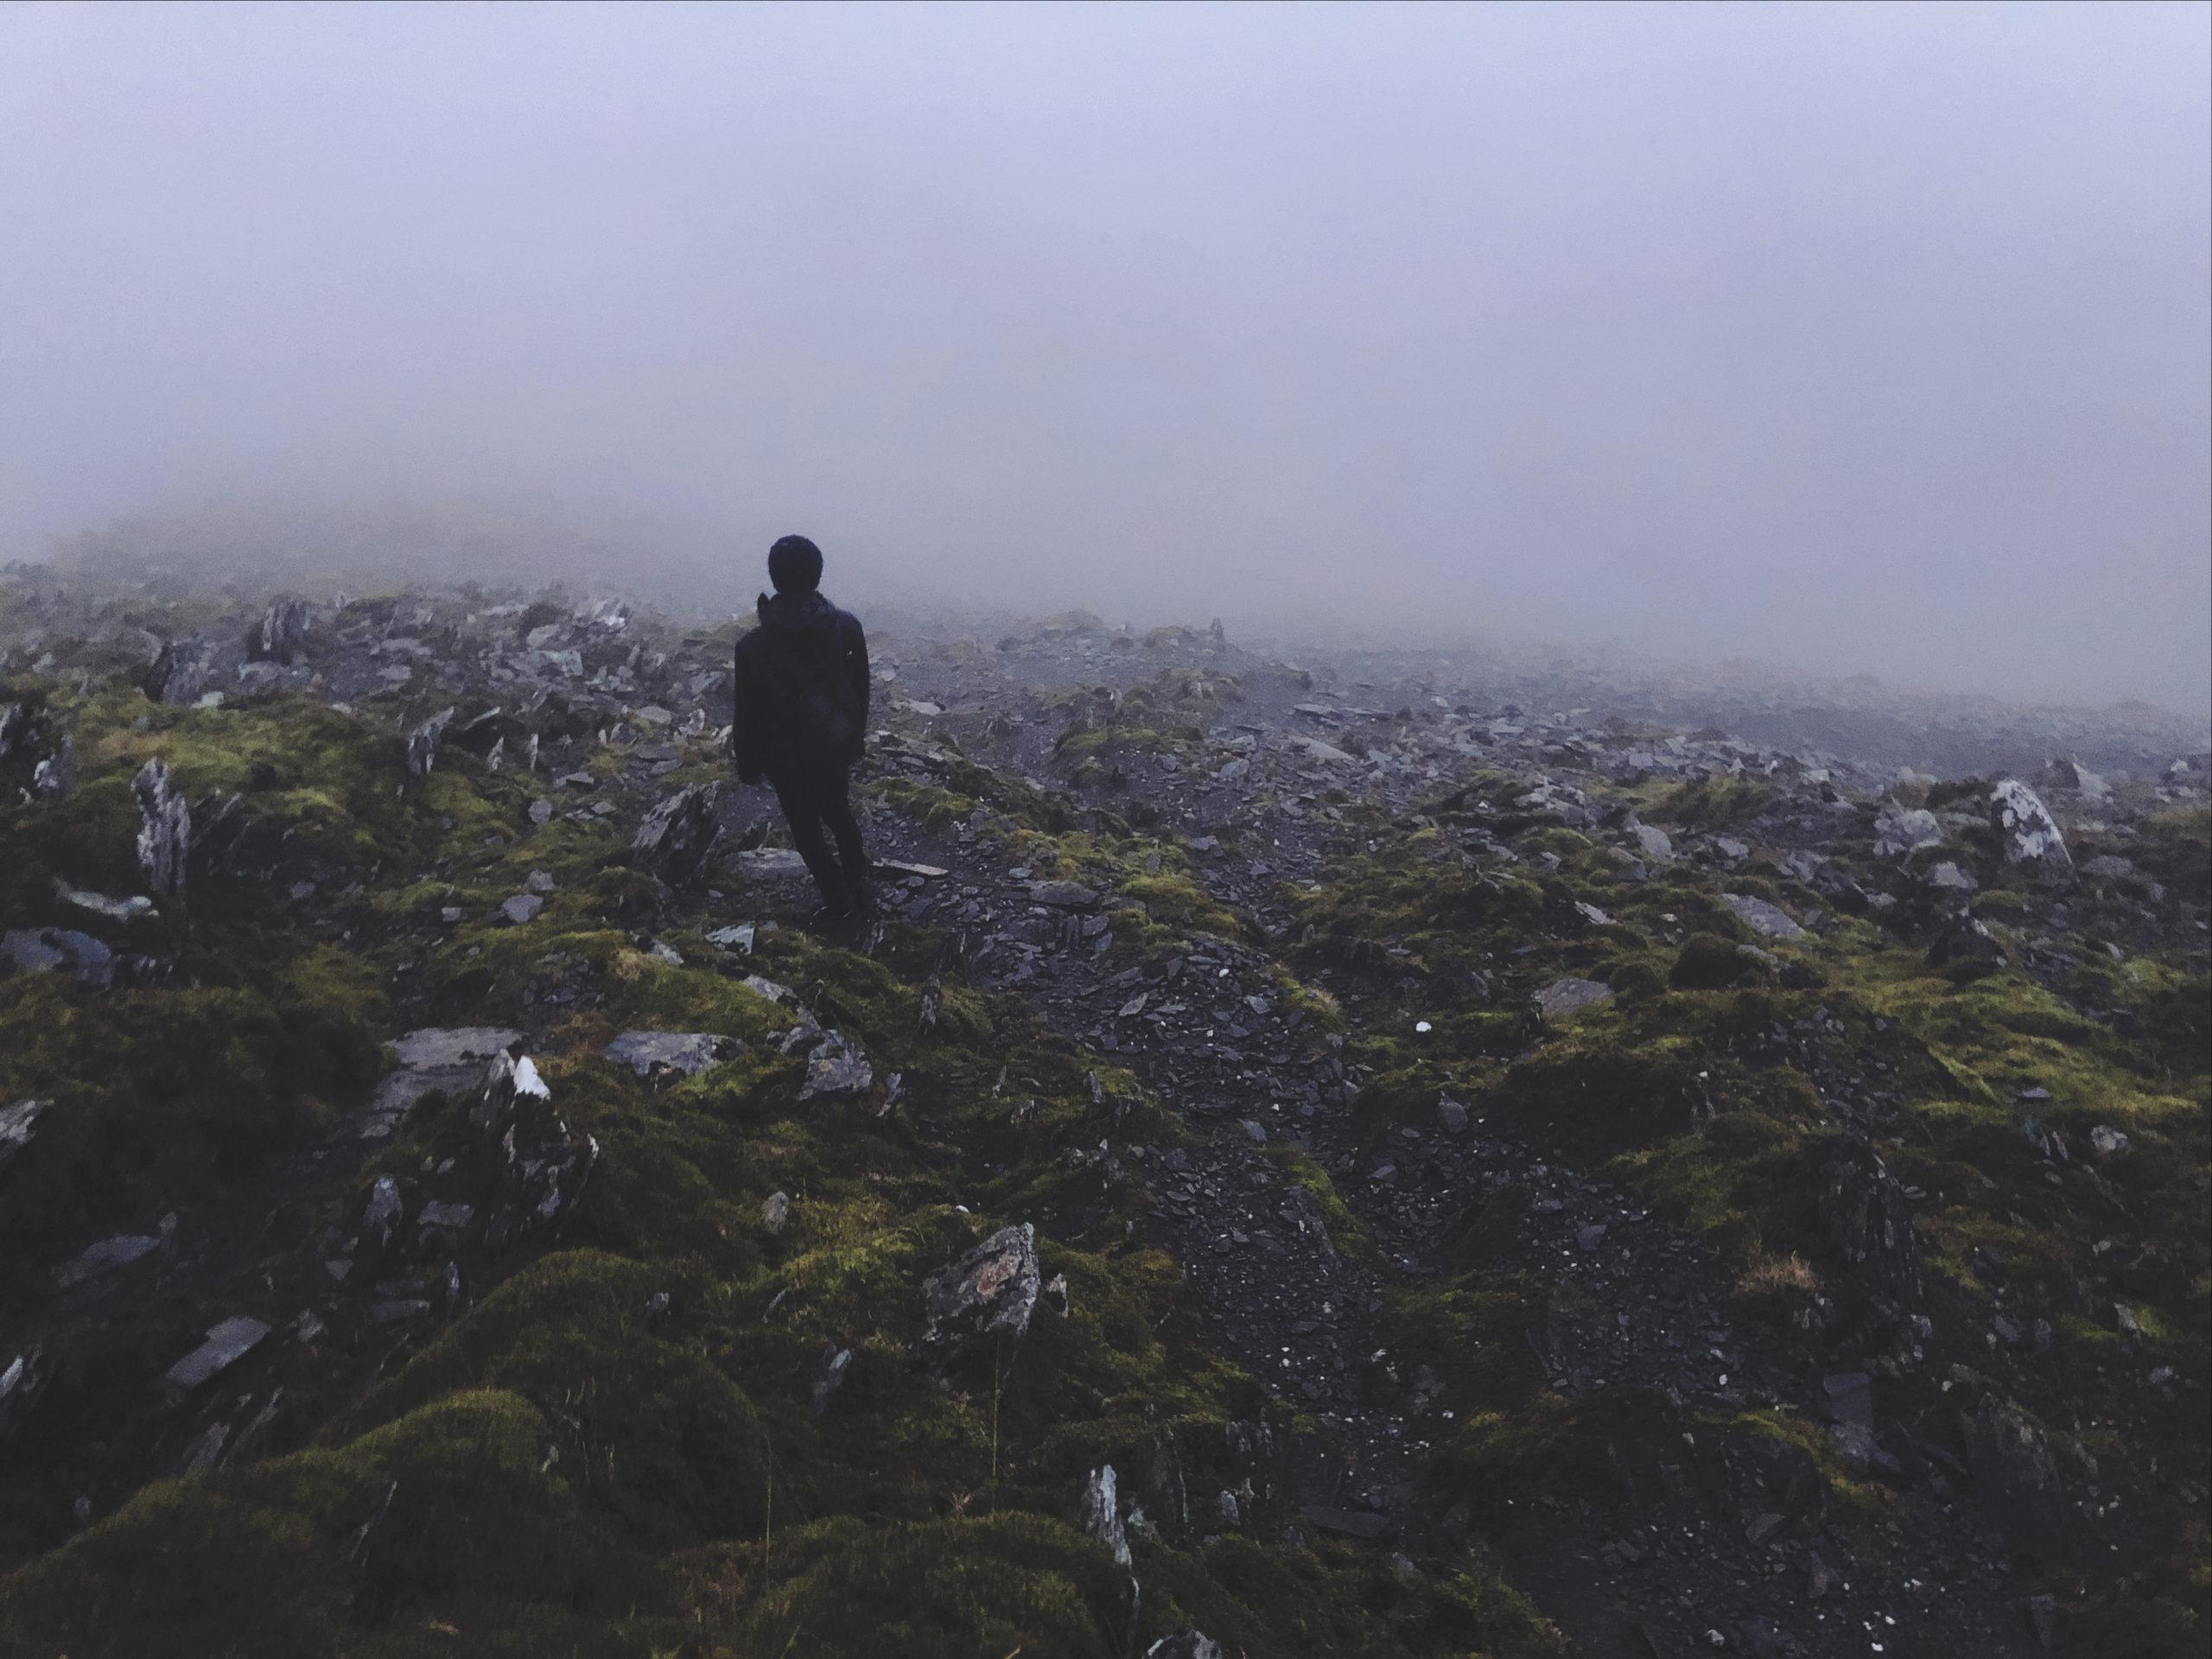 Pays de Galles rando brume tempête